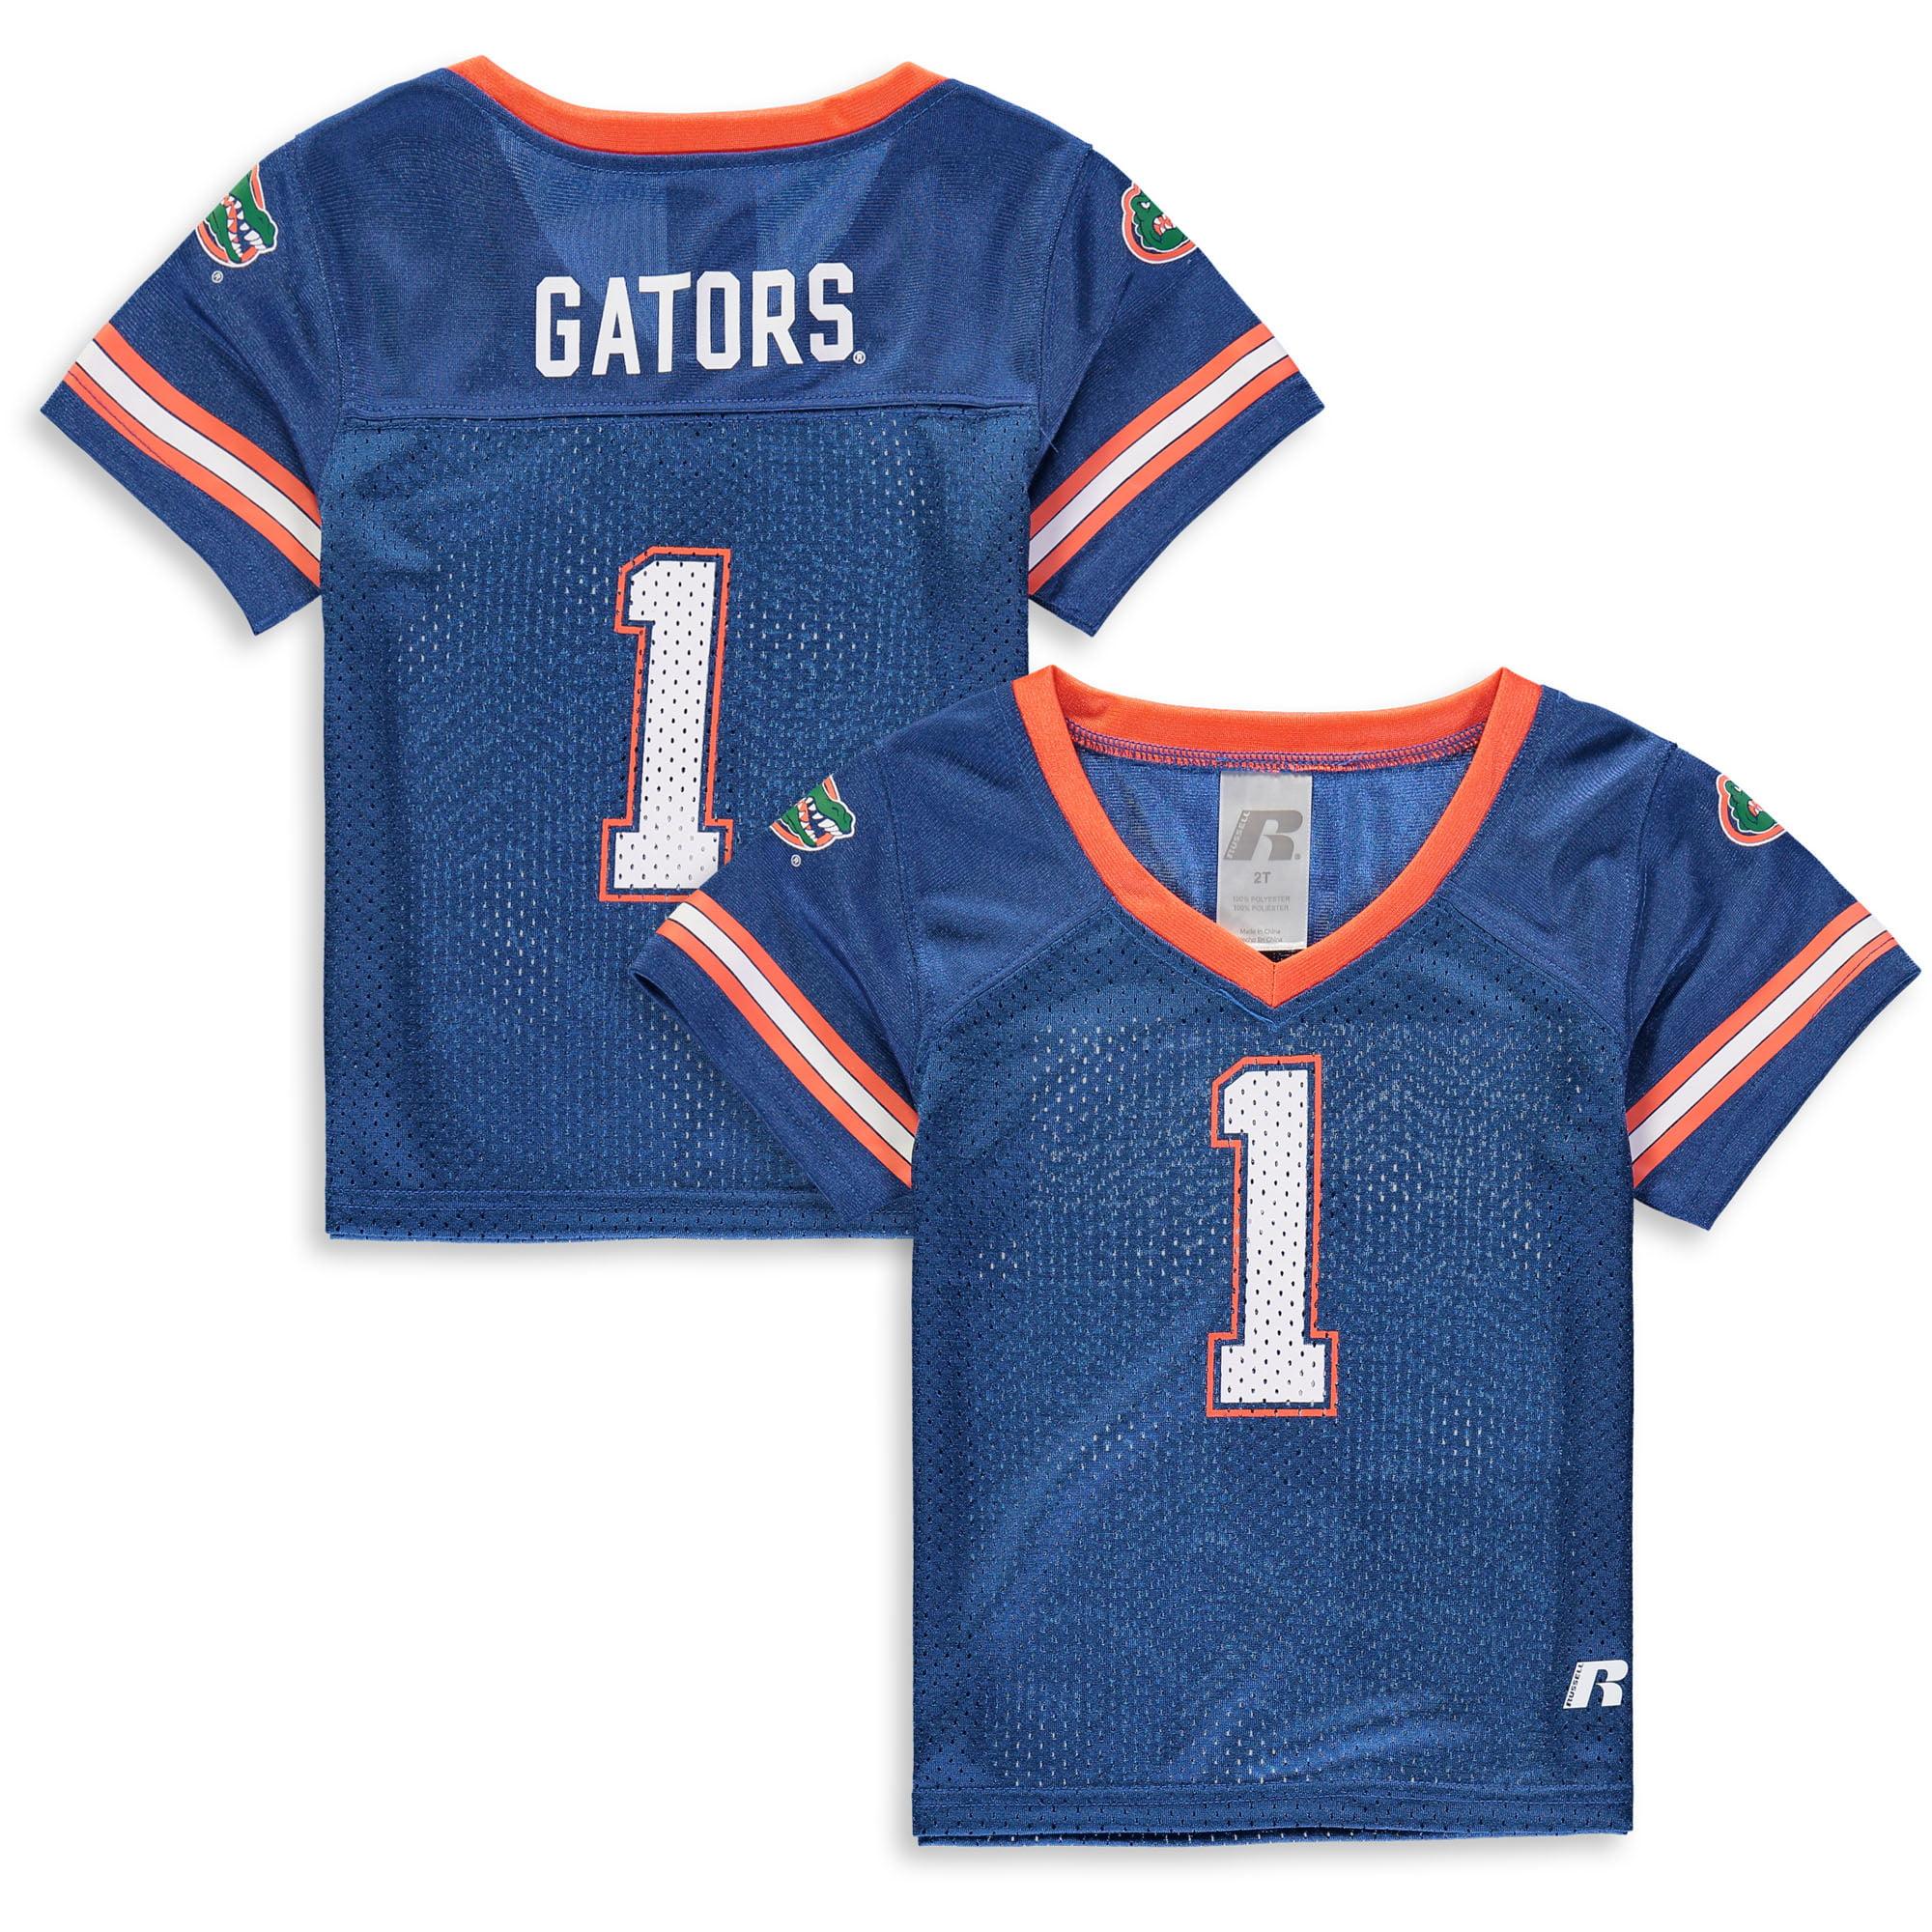 Toddler Russell Royal Florida Gators Replica Football Jersey